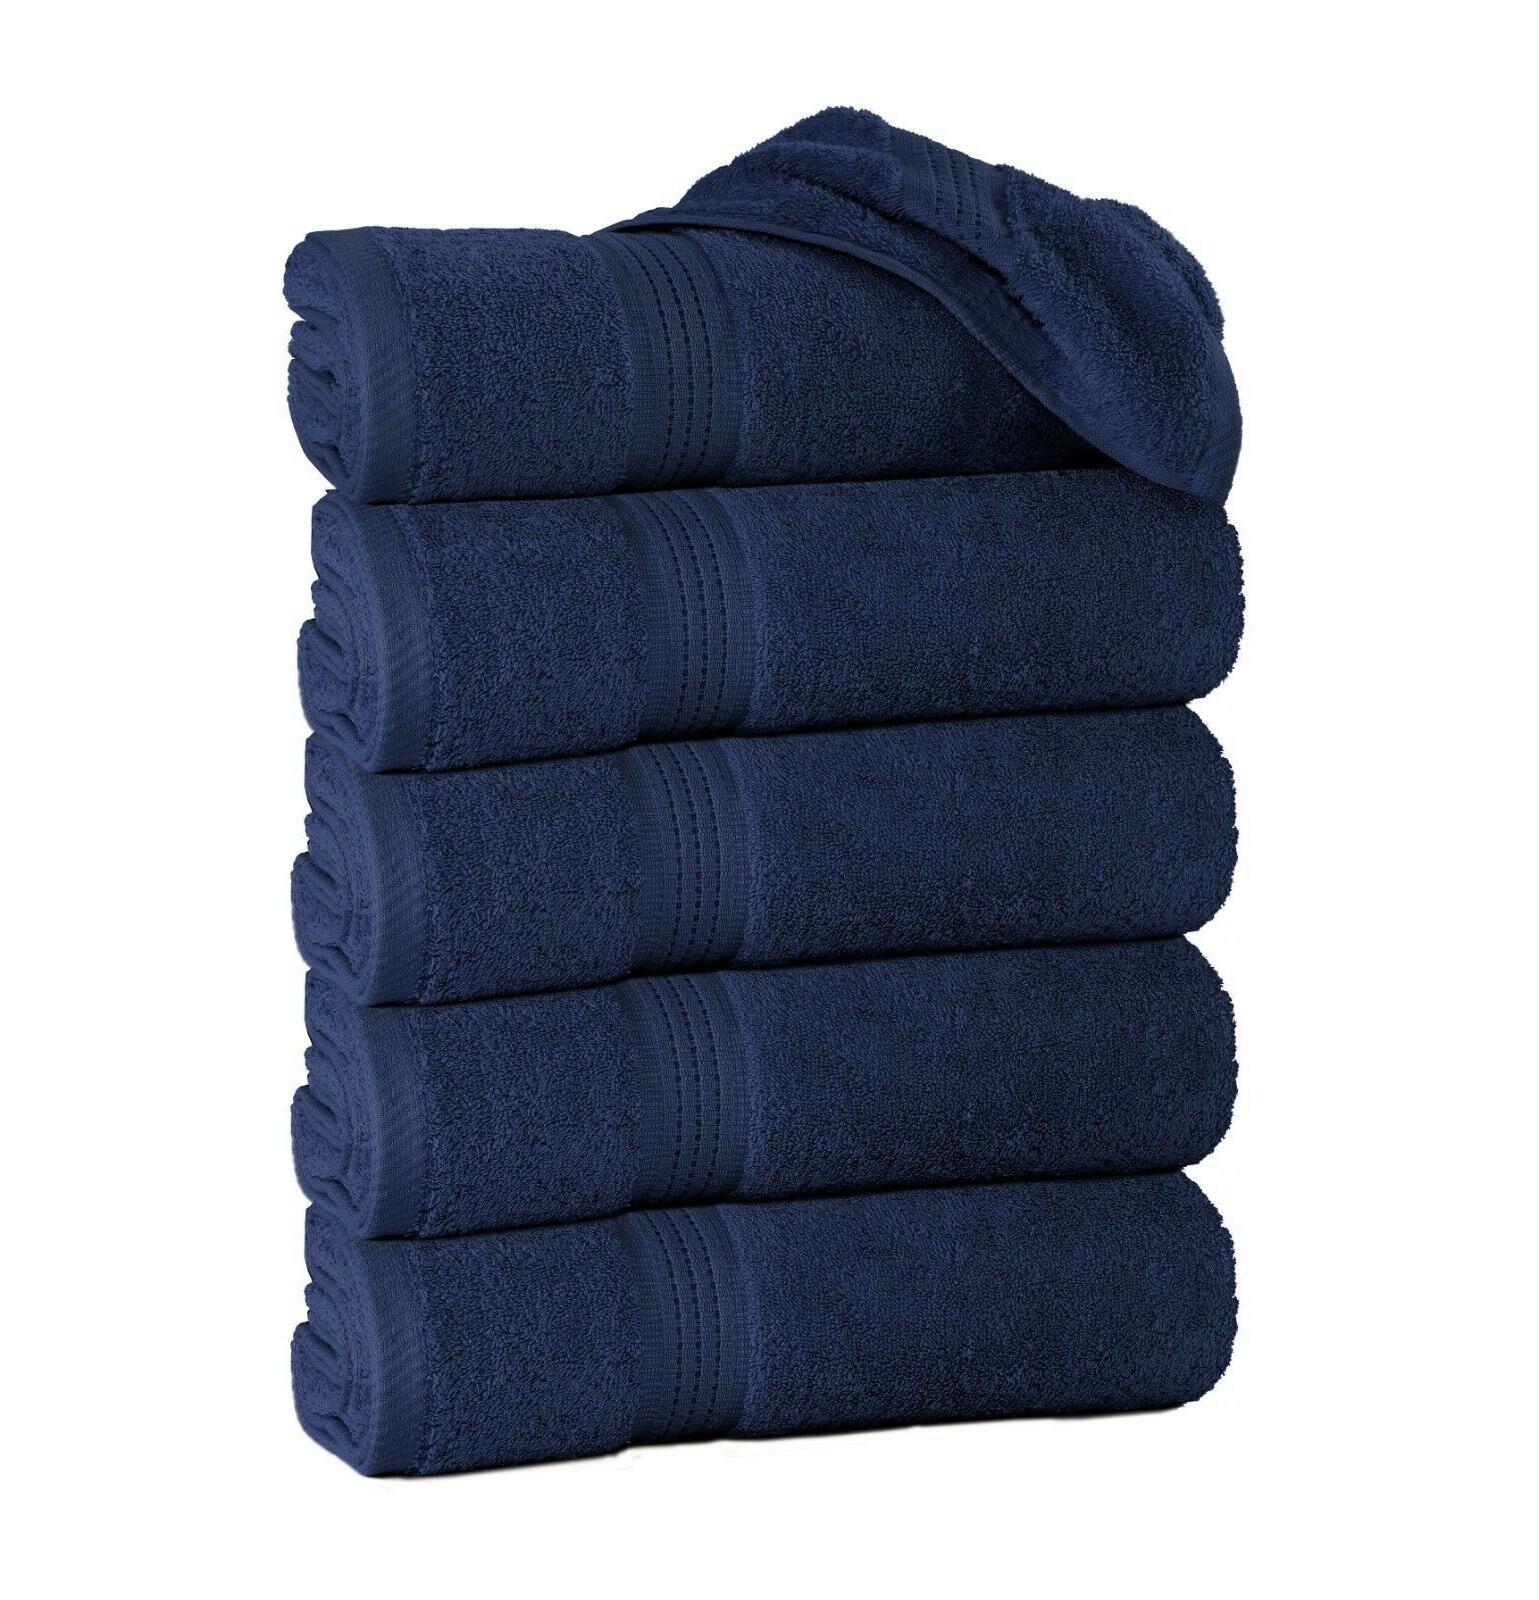 "Large Towel Packs Sets 100% Cotton 27""x55"" 500 Absorbent"